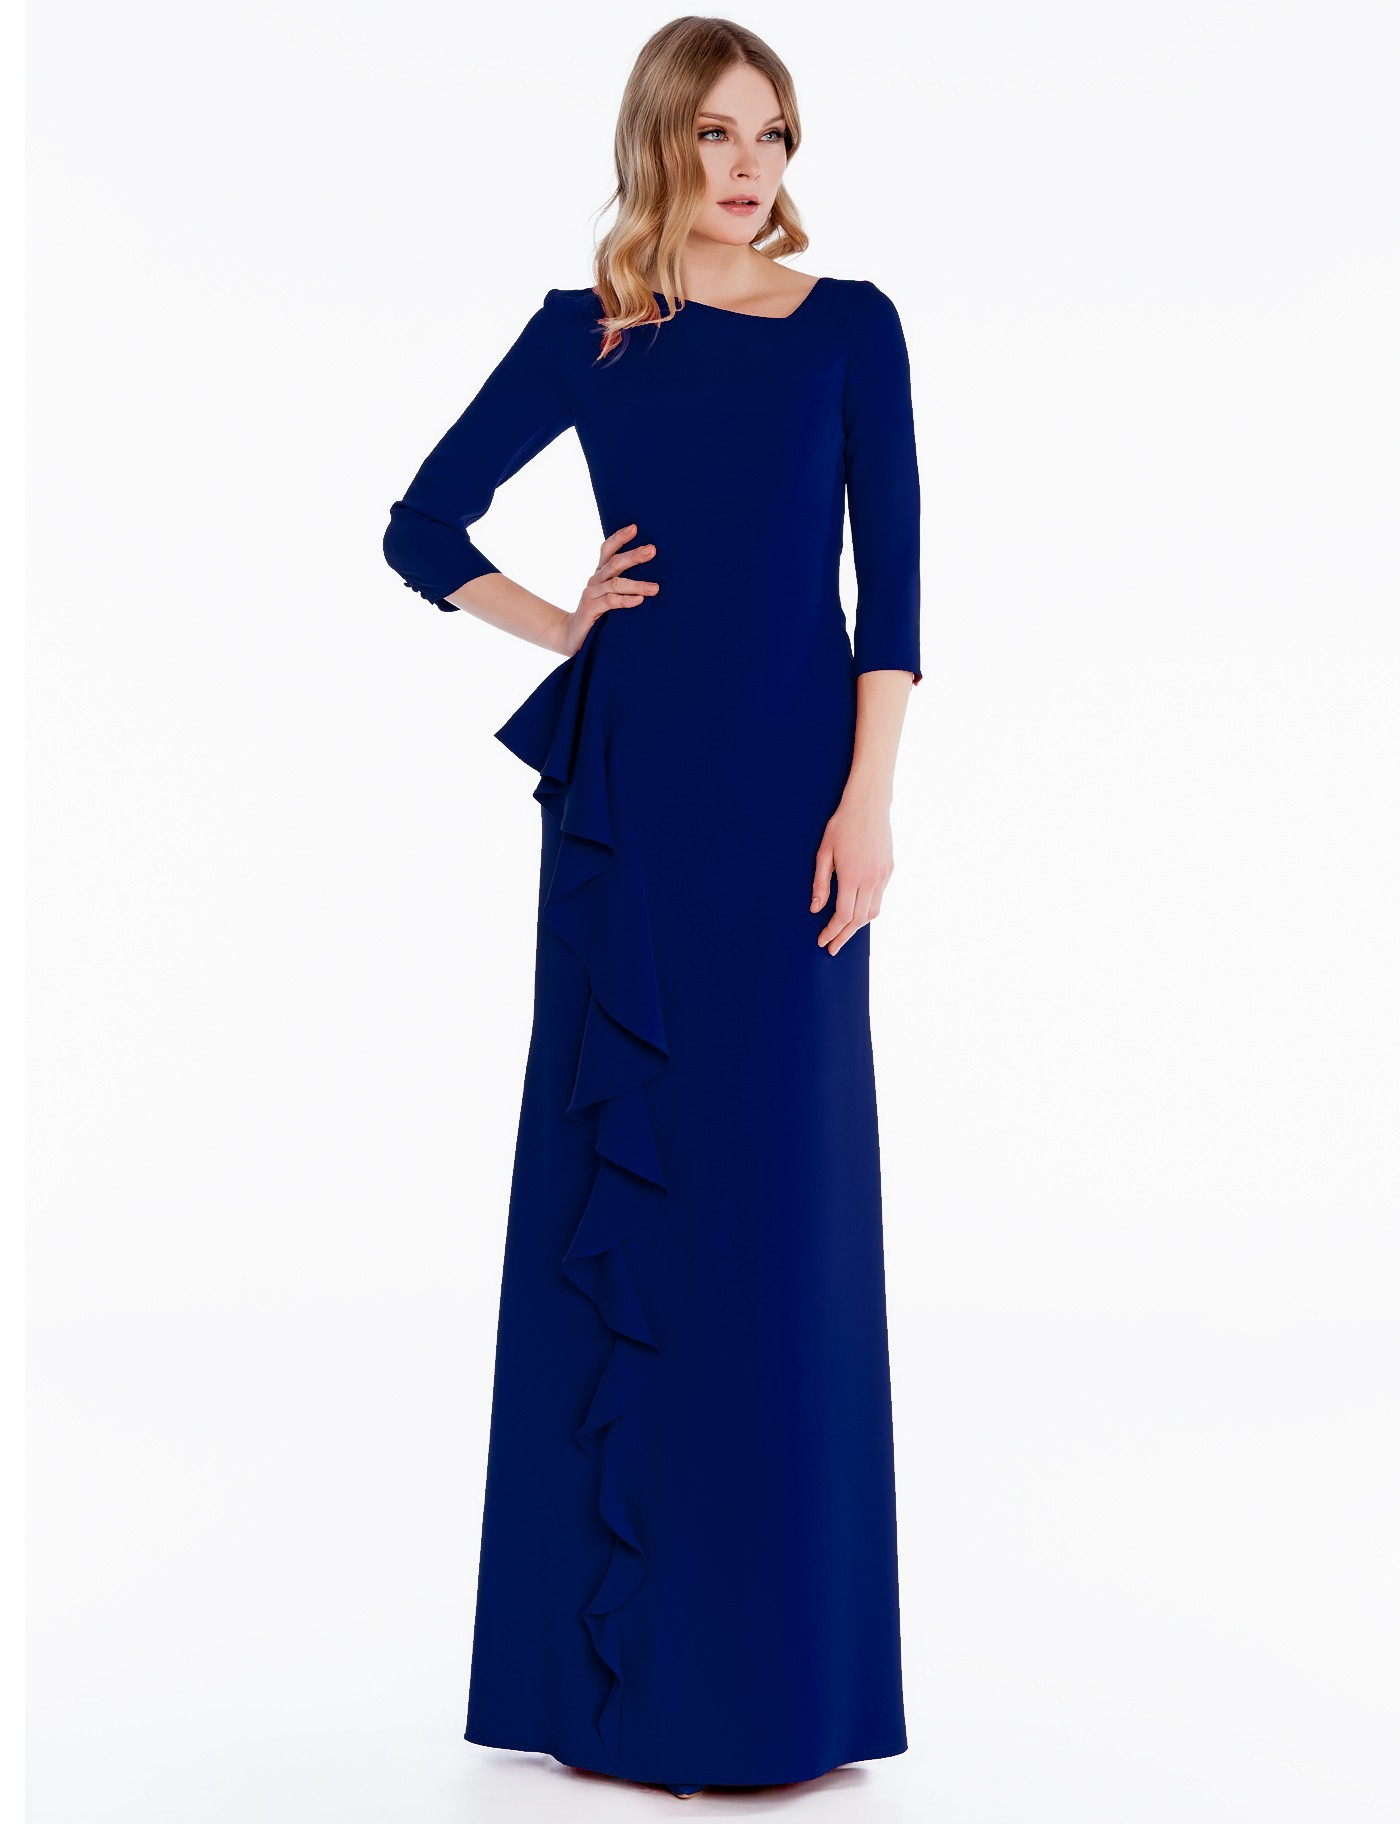 1fe981f1064c Abito lungo blu Sonia Pena 1180003 - Rosapiuma On-Line Boutique